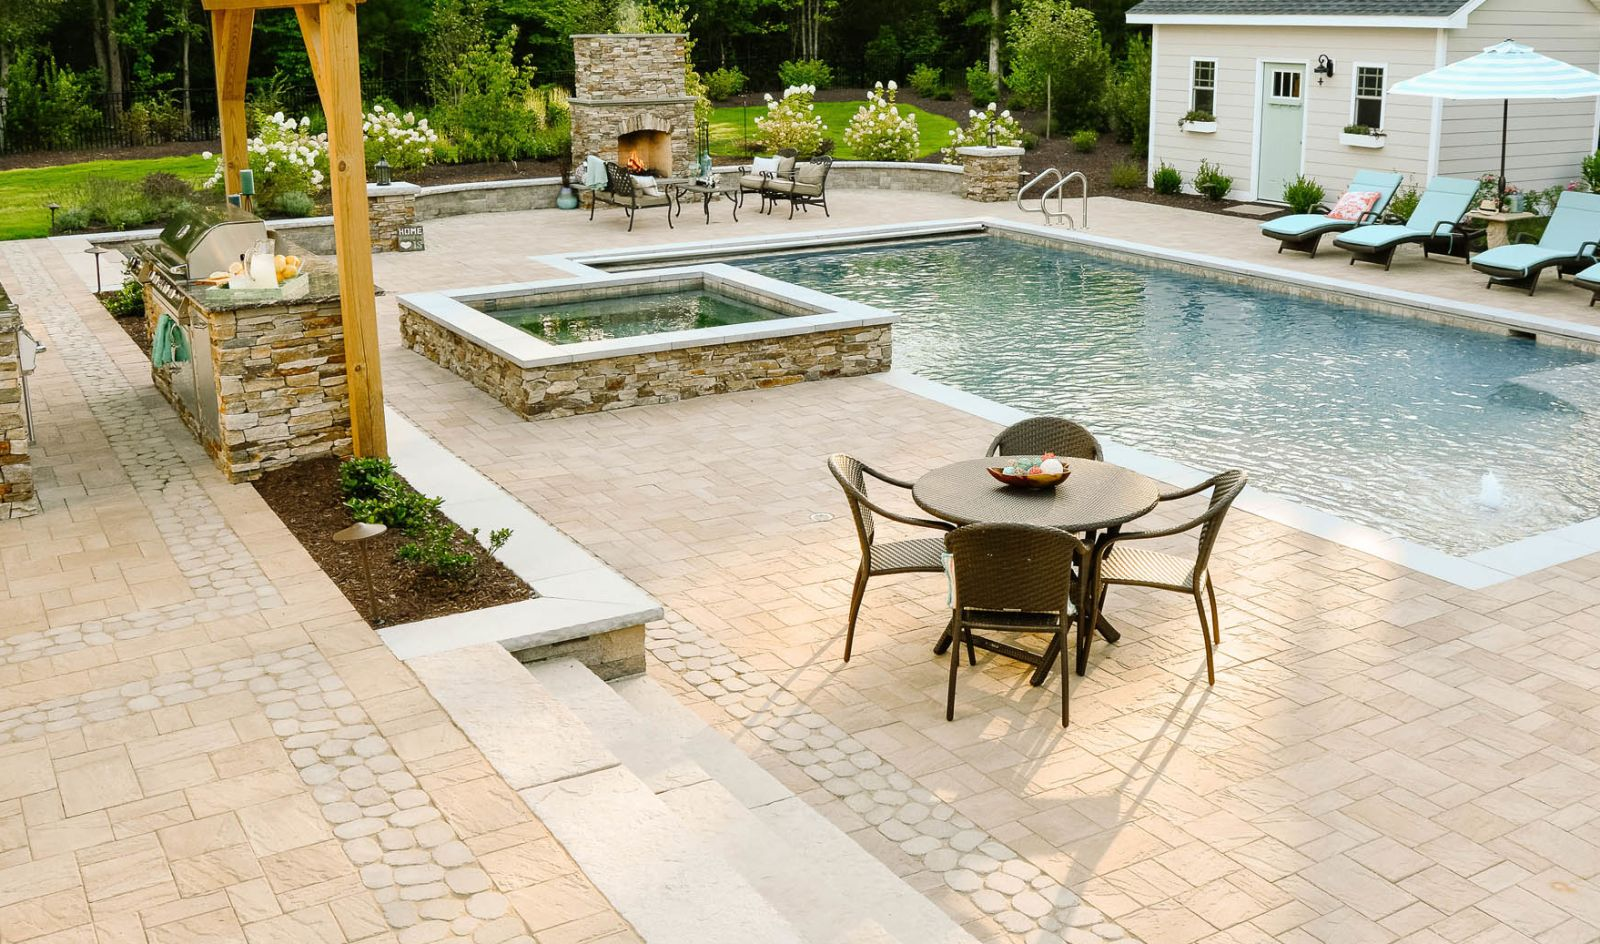 Backyard fiberglass pool and hot tub and entertainment area